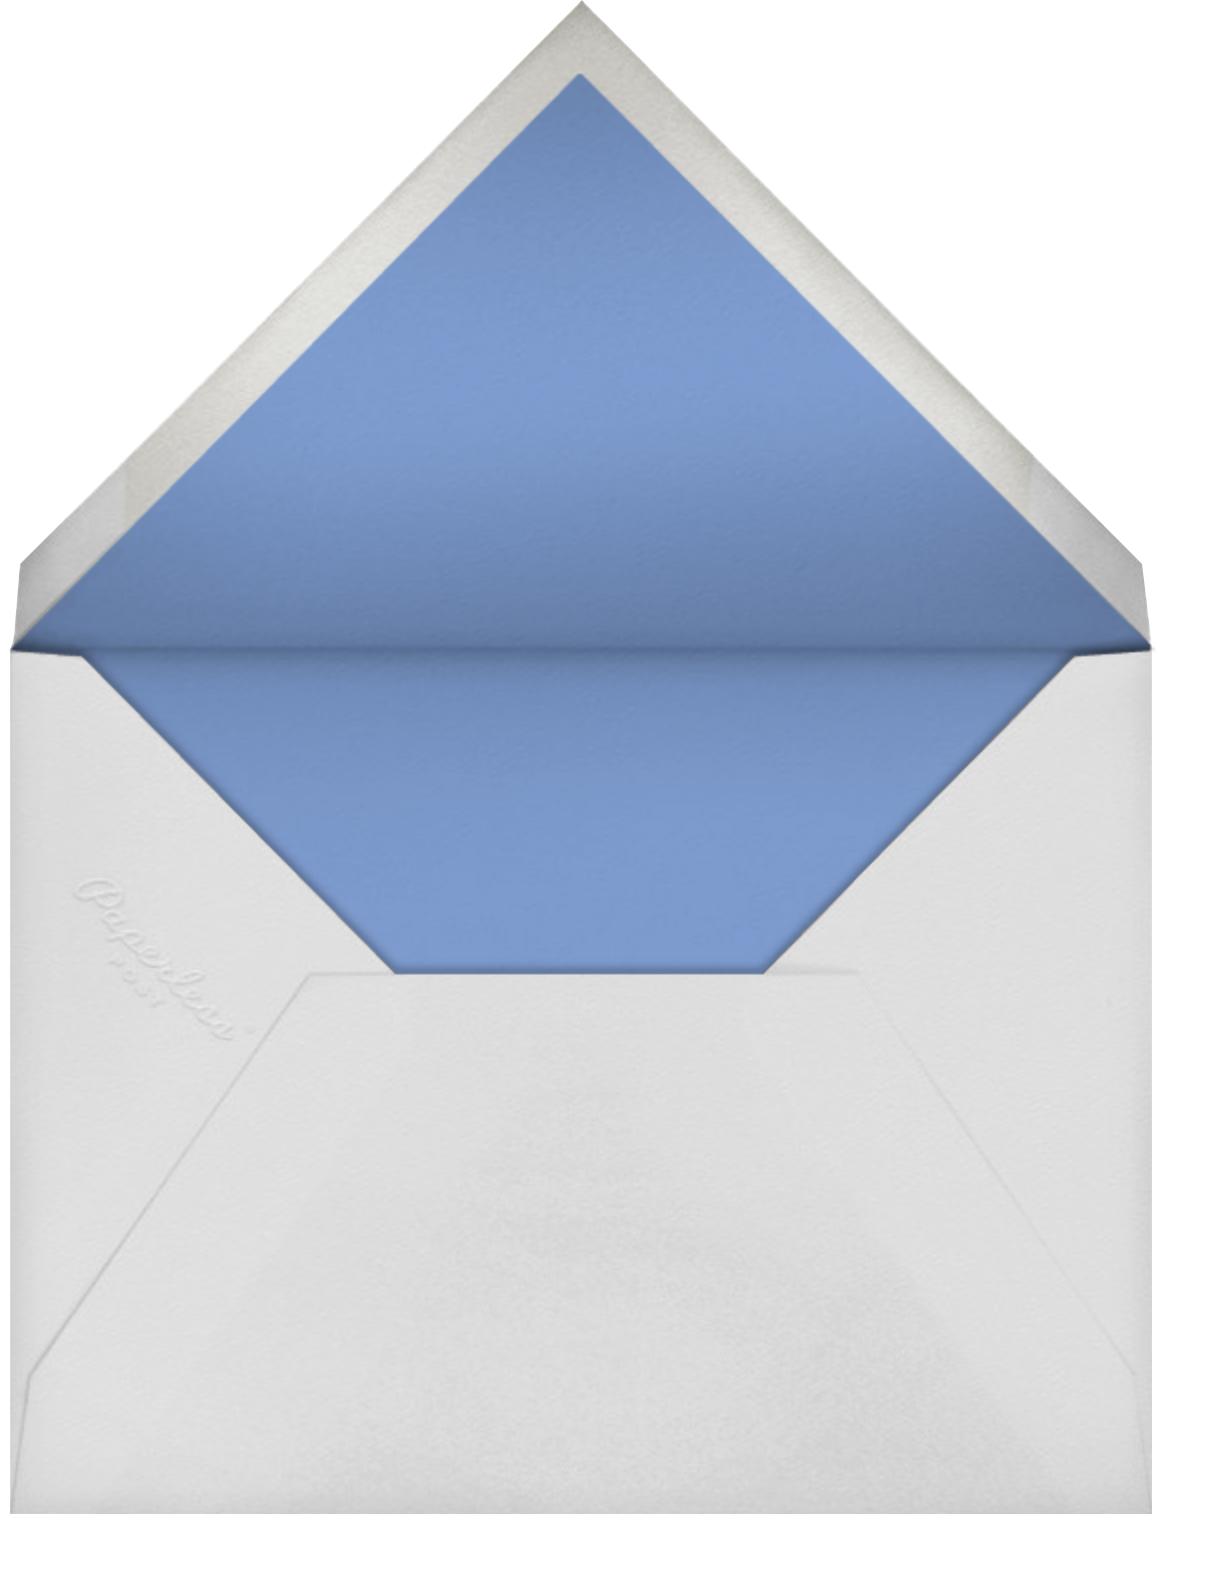 Firth - Newport Blue - Vera Wang - General entertaining - envelope back